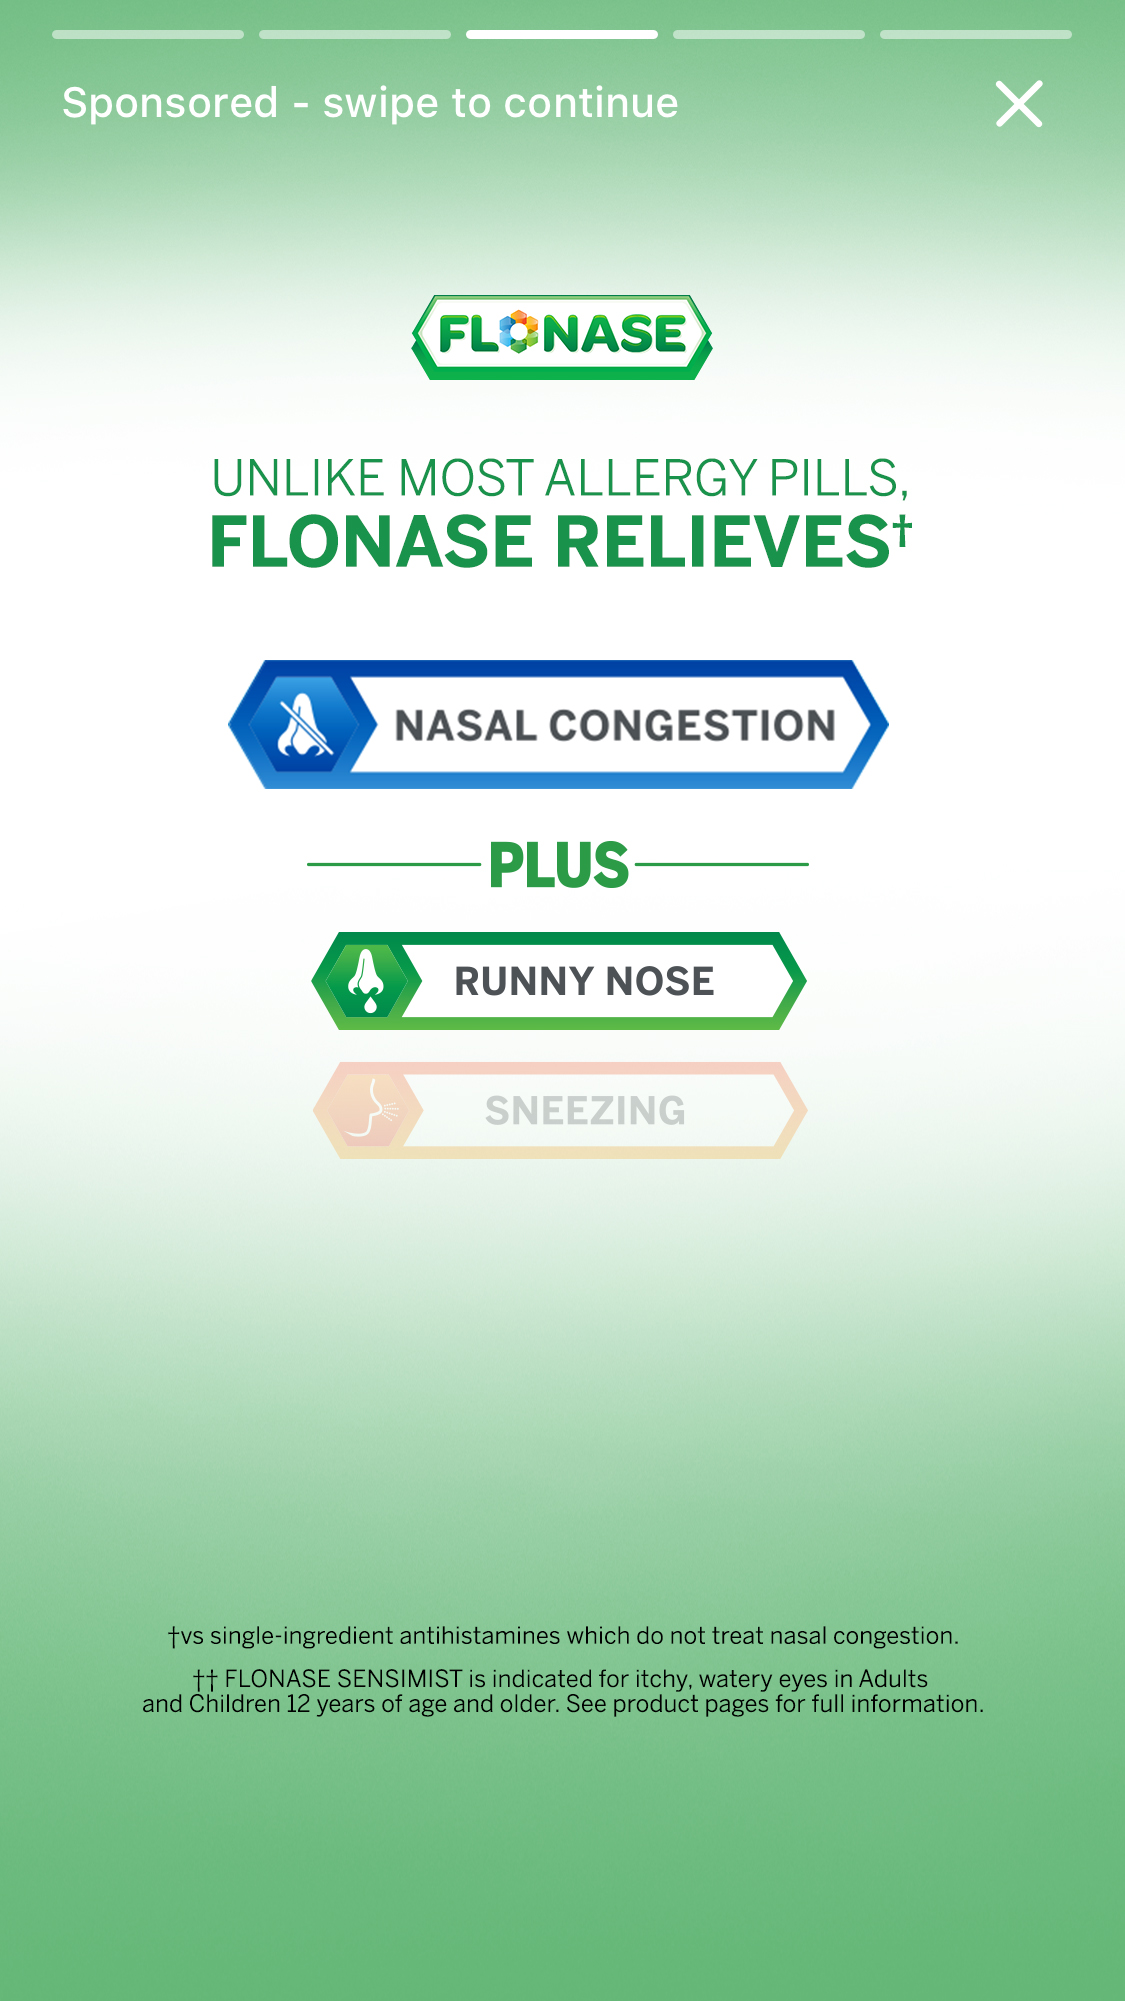 Flonase_IS_0002_3